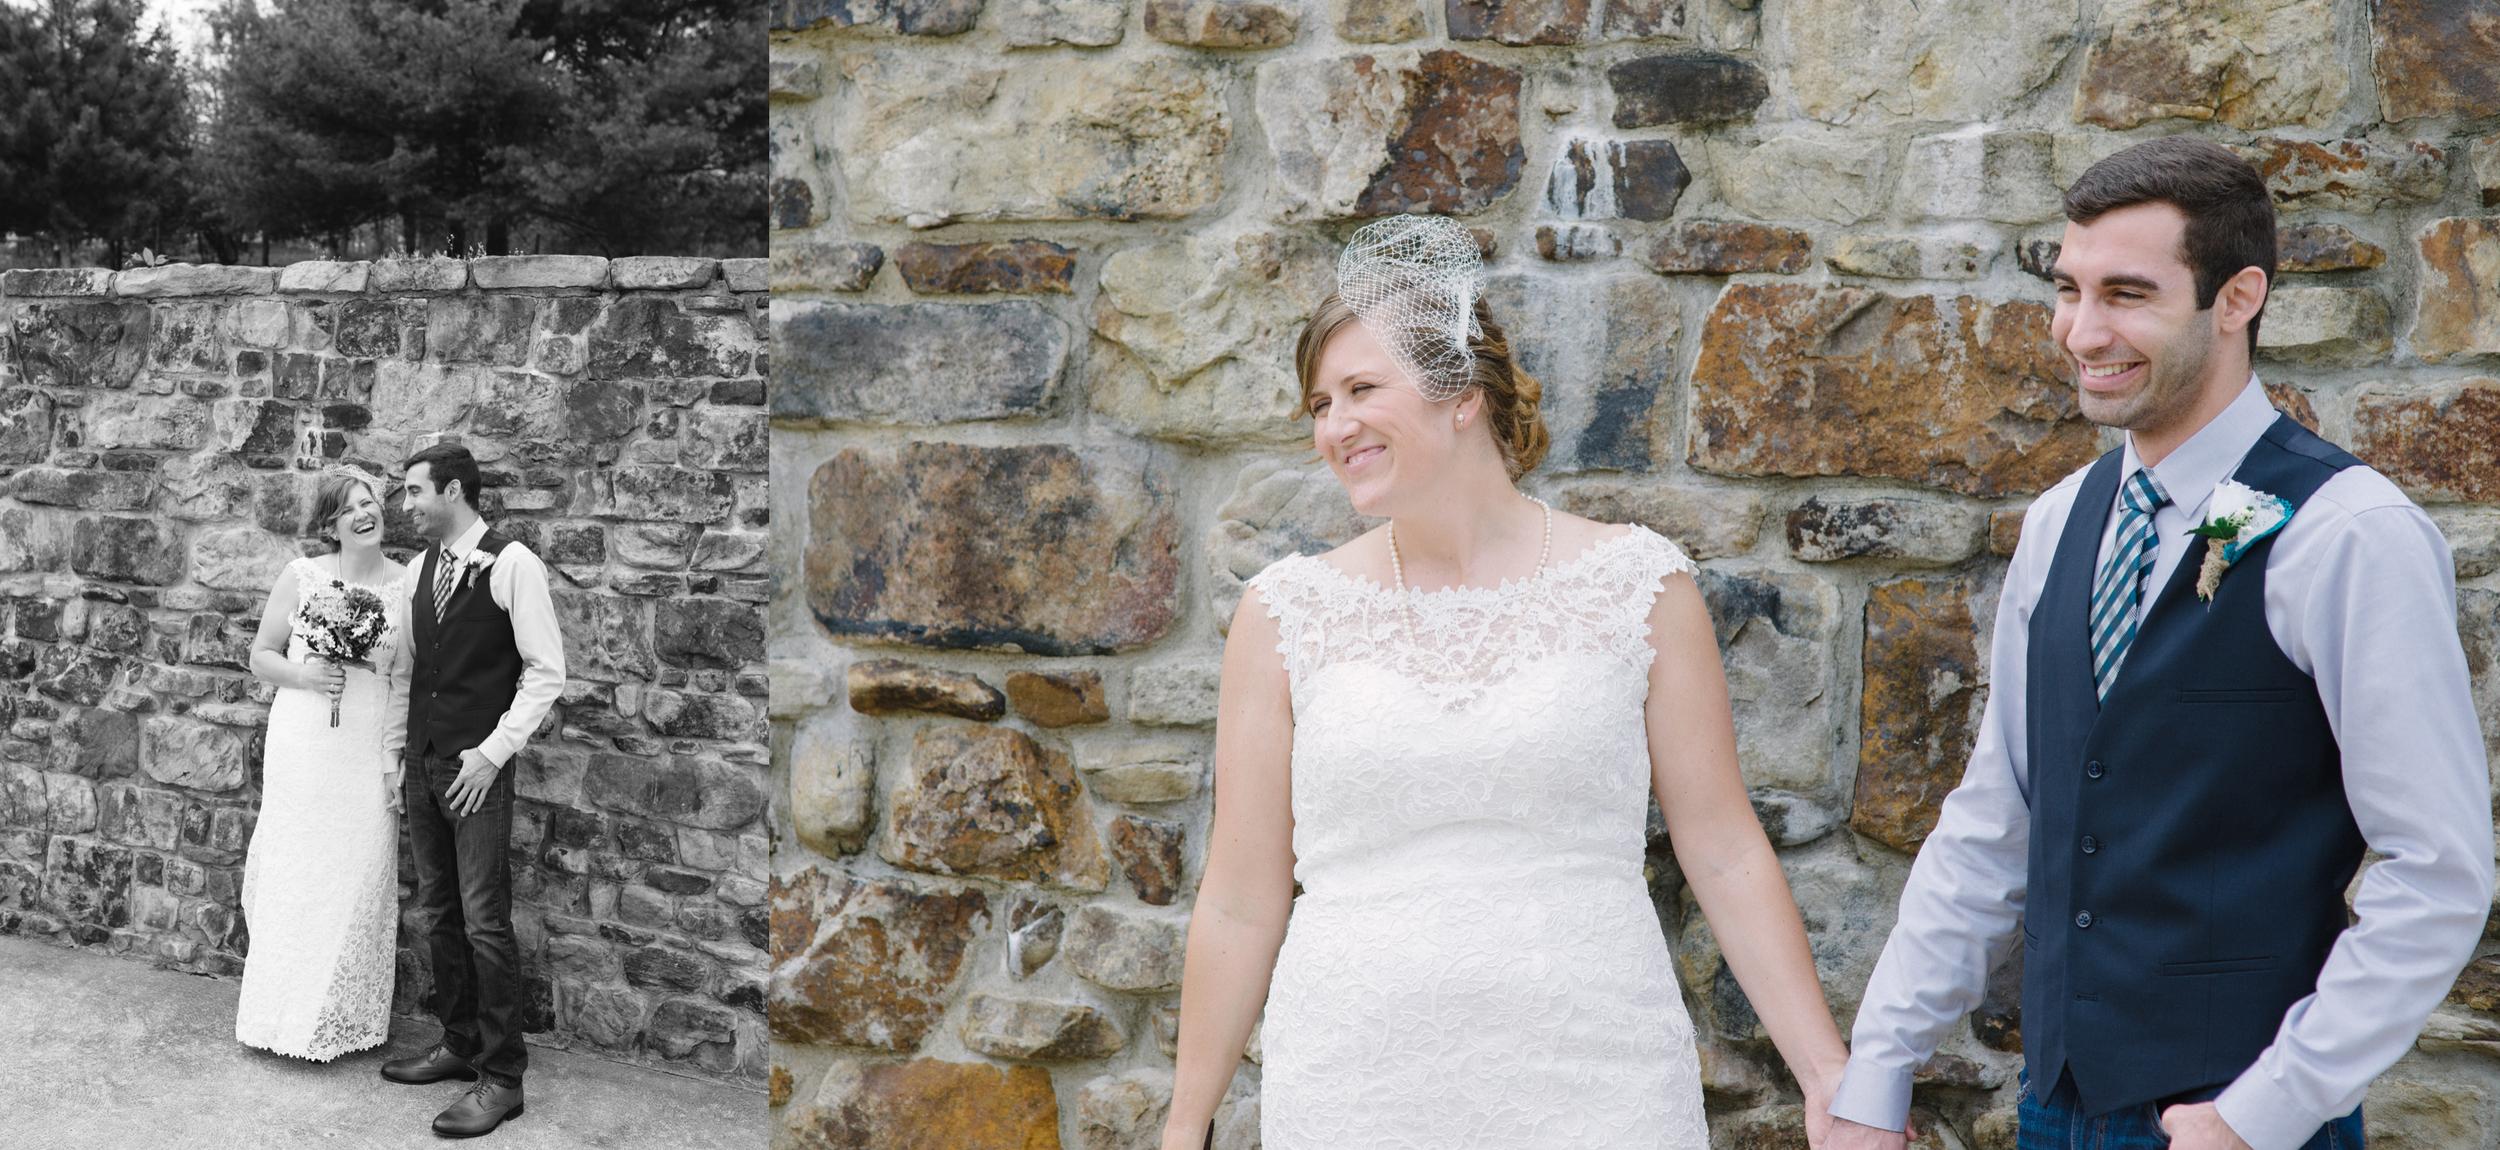 Oak Lodge Wedding Photographer Ligonier PA weddings.jpg